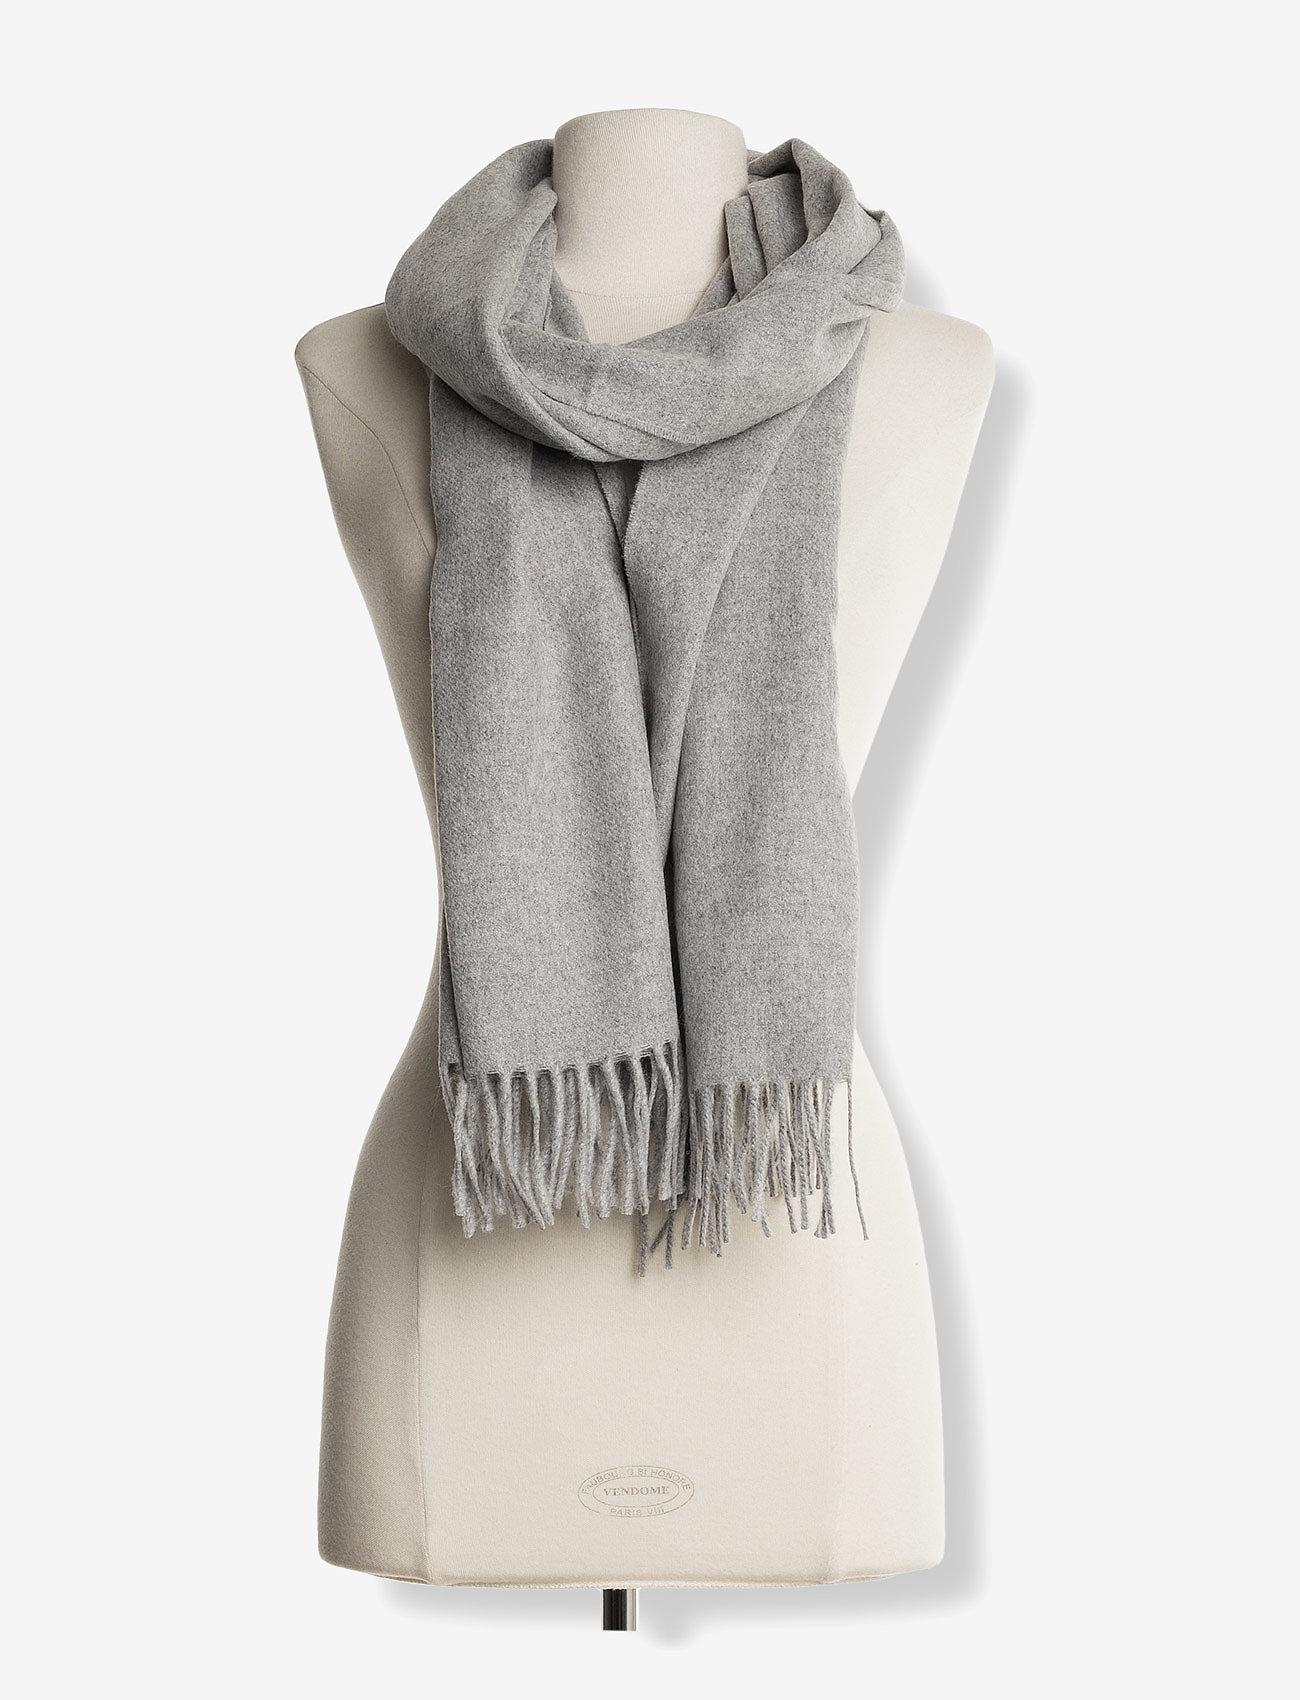 Samsøe Samsøe Accola maxi scarf 2862 - Szaliki i chusty GREY MEL. - Akcesoria